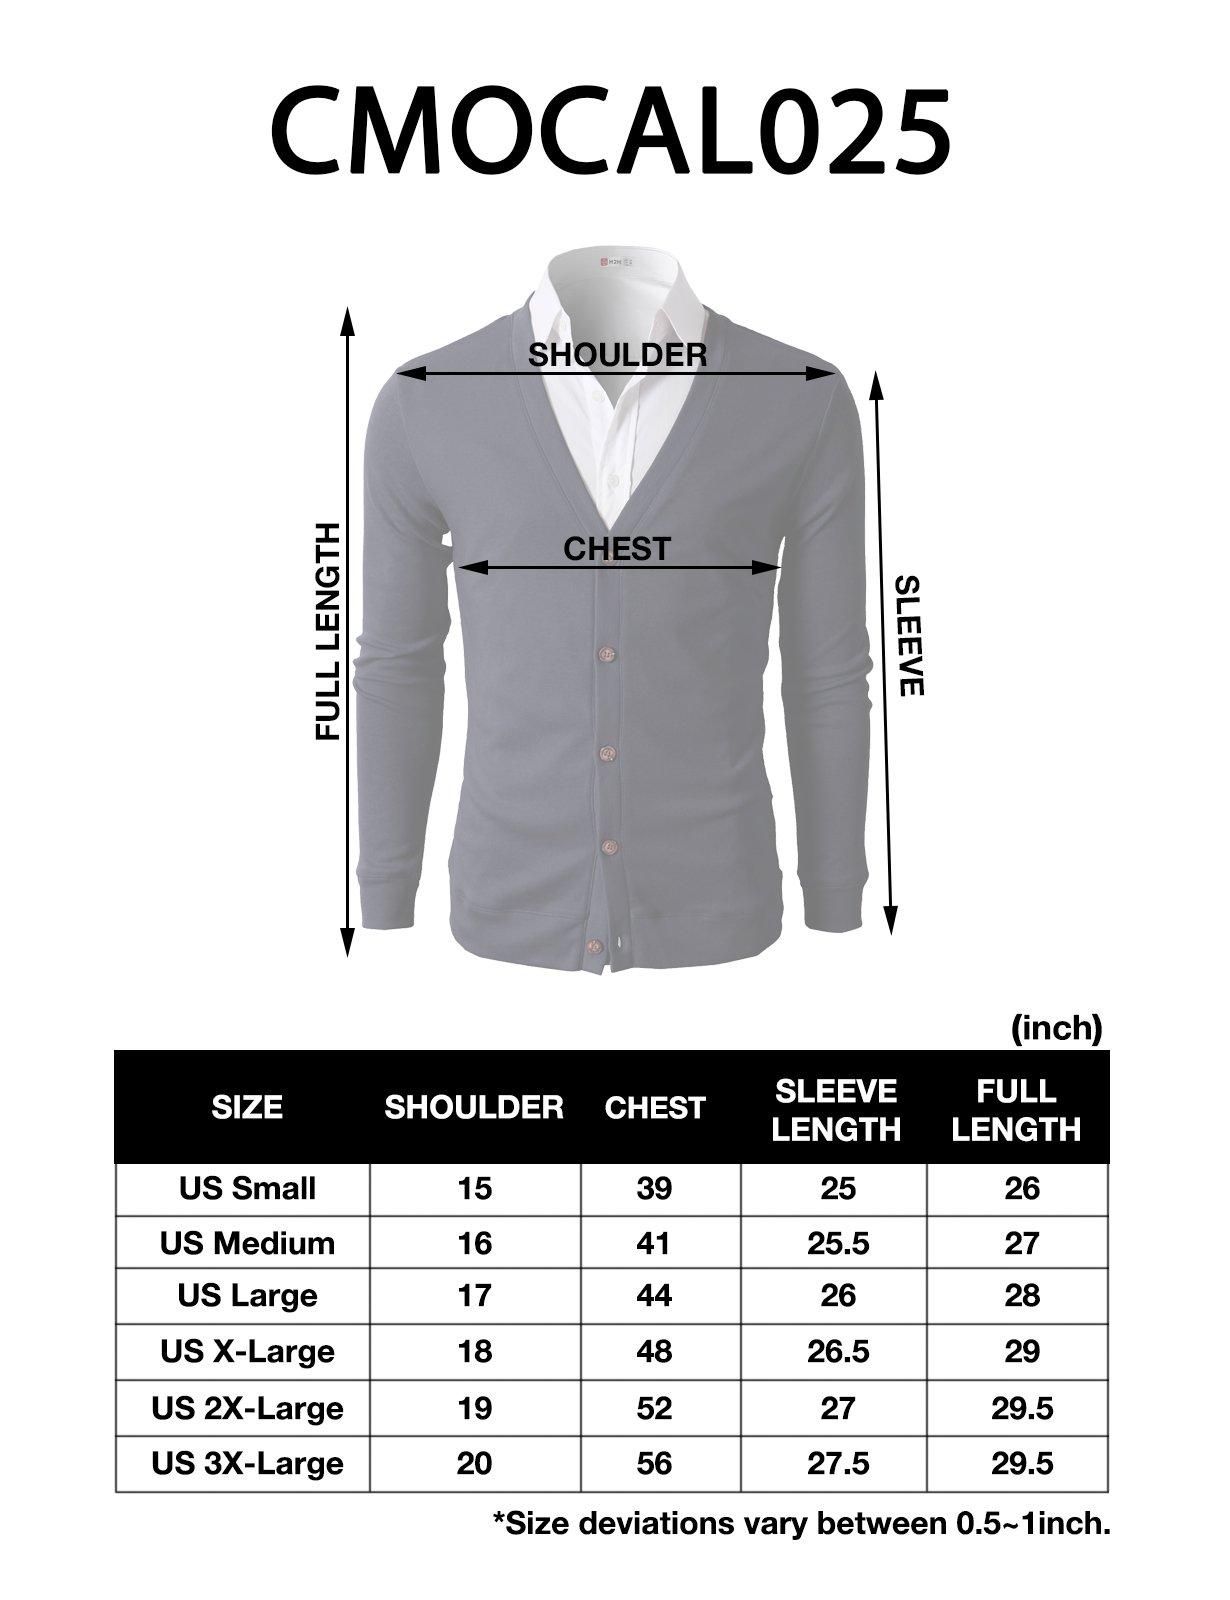 H2H Mens Slim Fit Light Weight V-Neck Cardigan Black US M/Asia L (CMOCAL025) by H2H (Image #6)